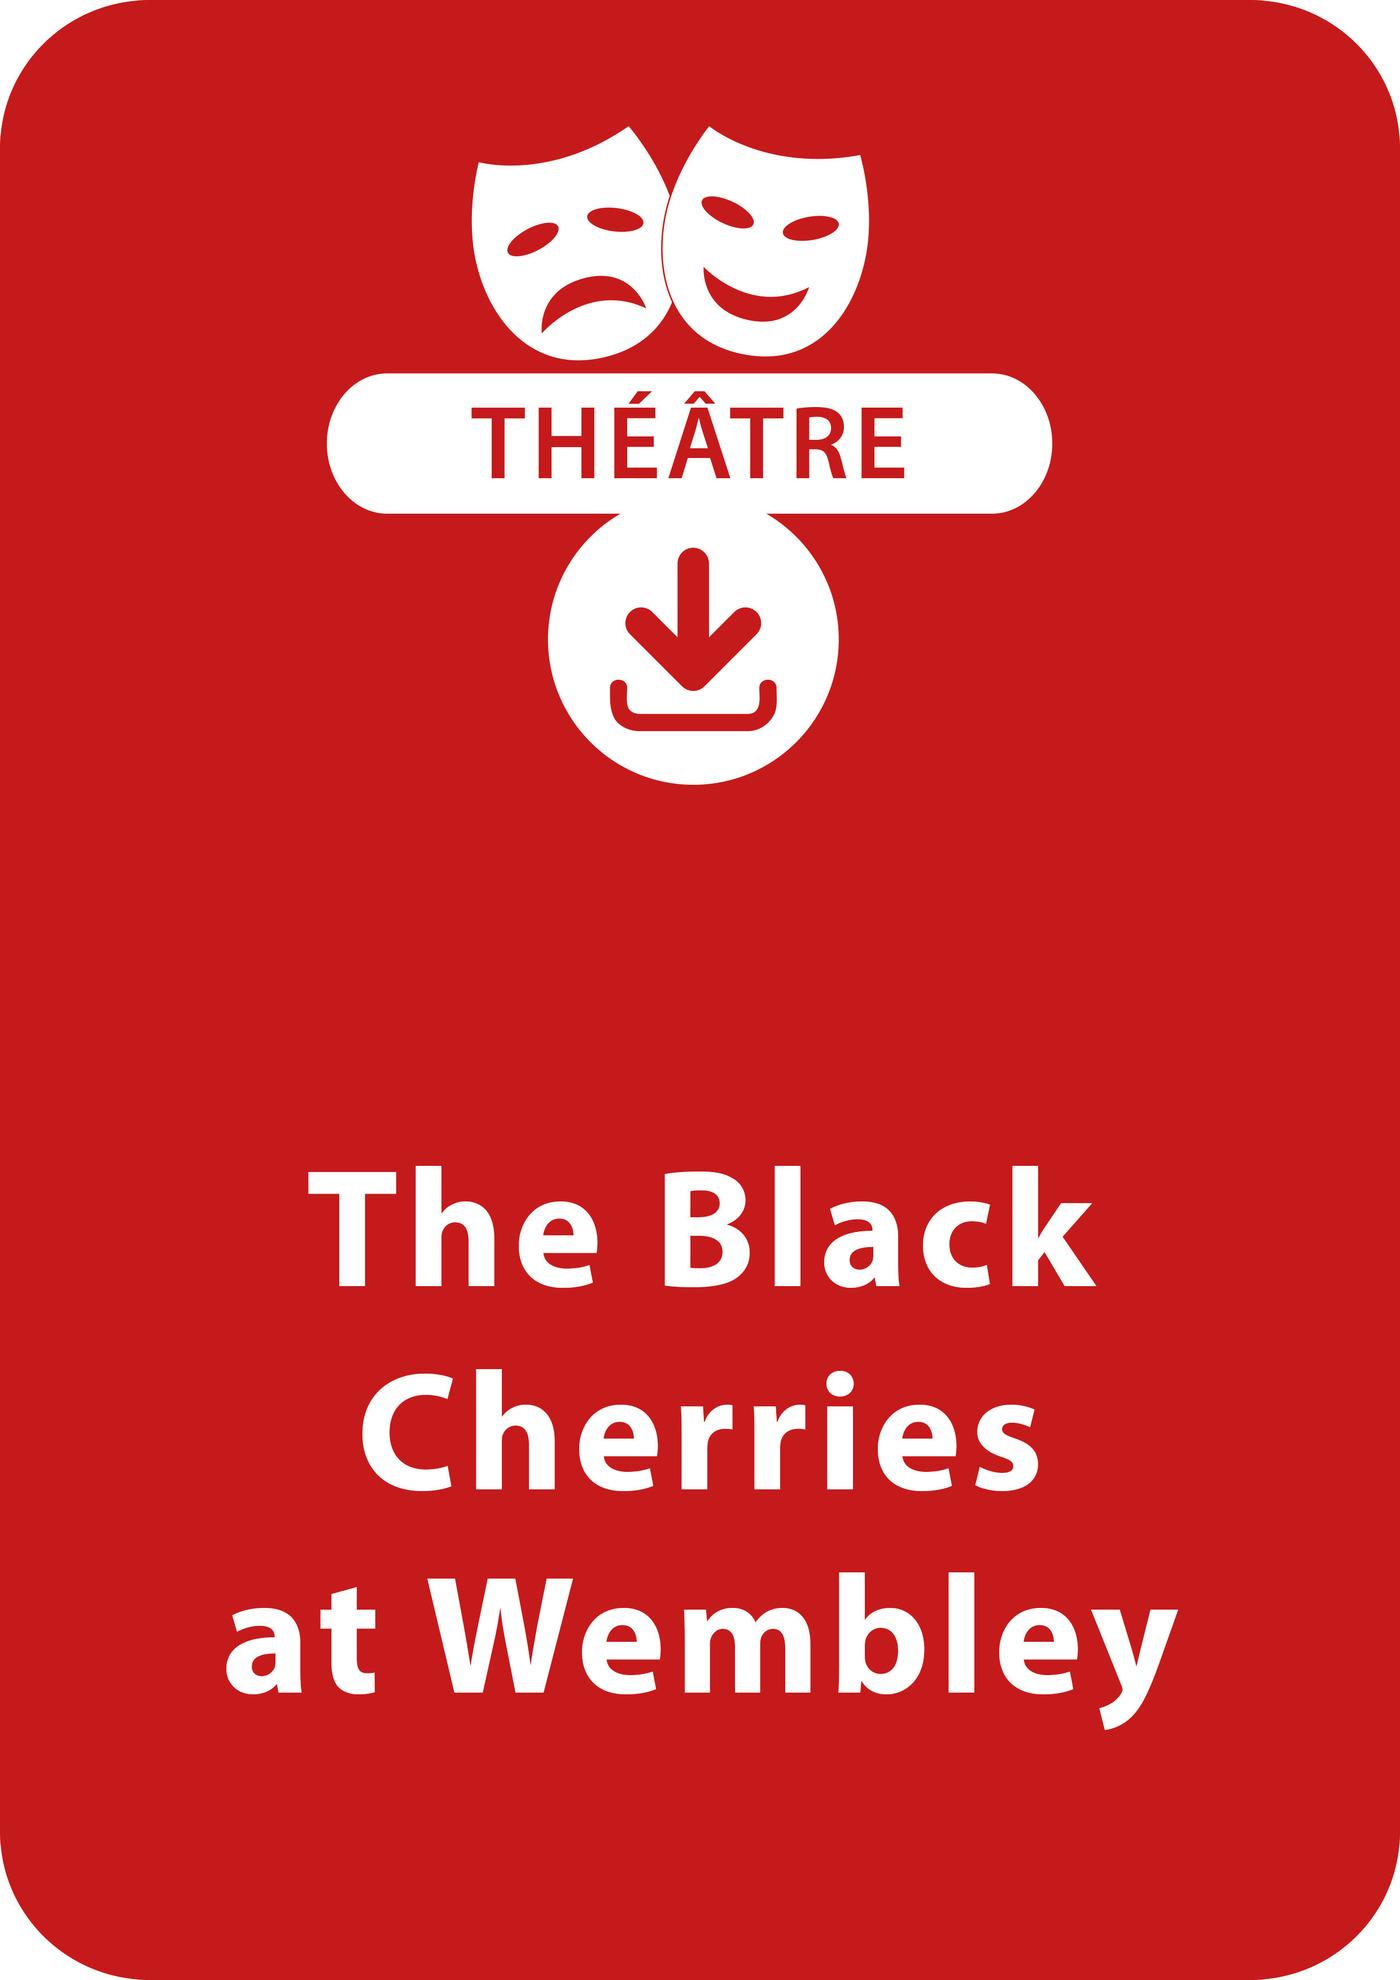 The Black Cherries at Wembley